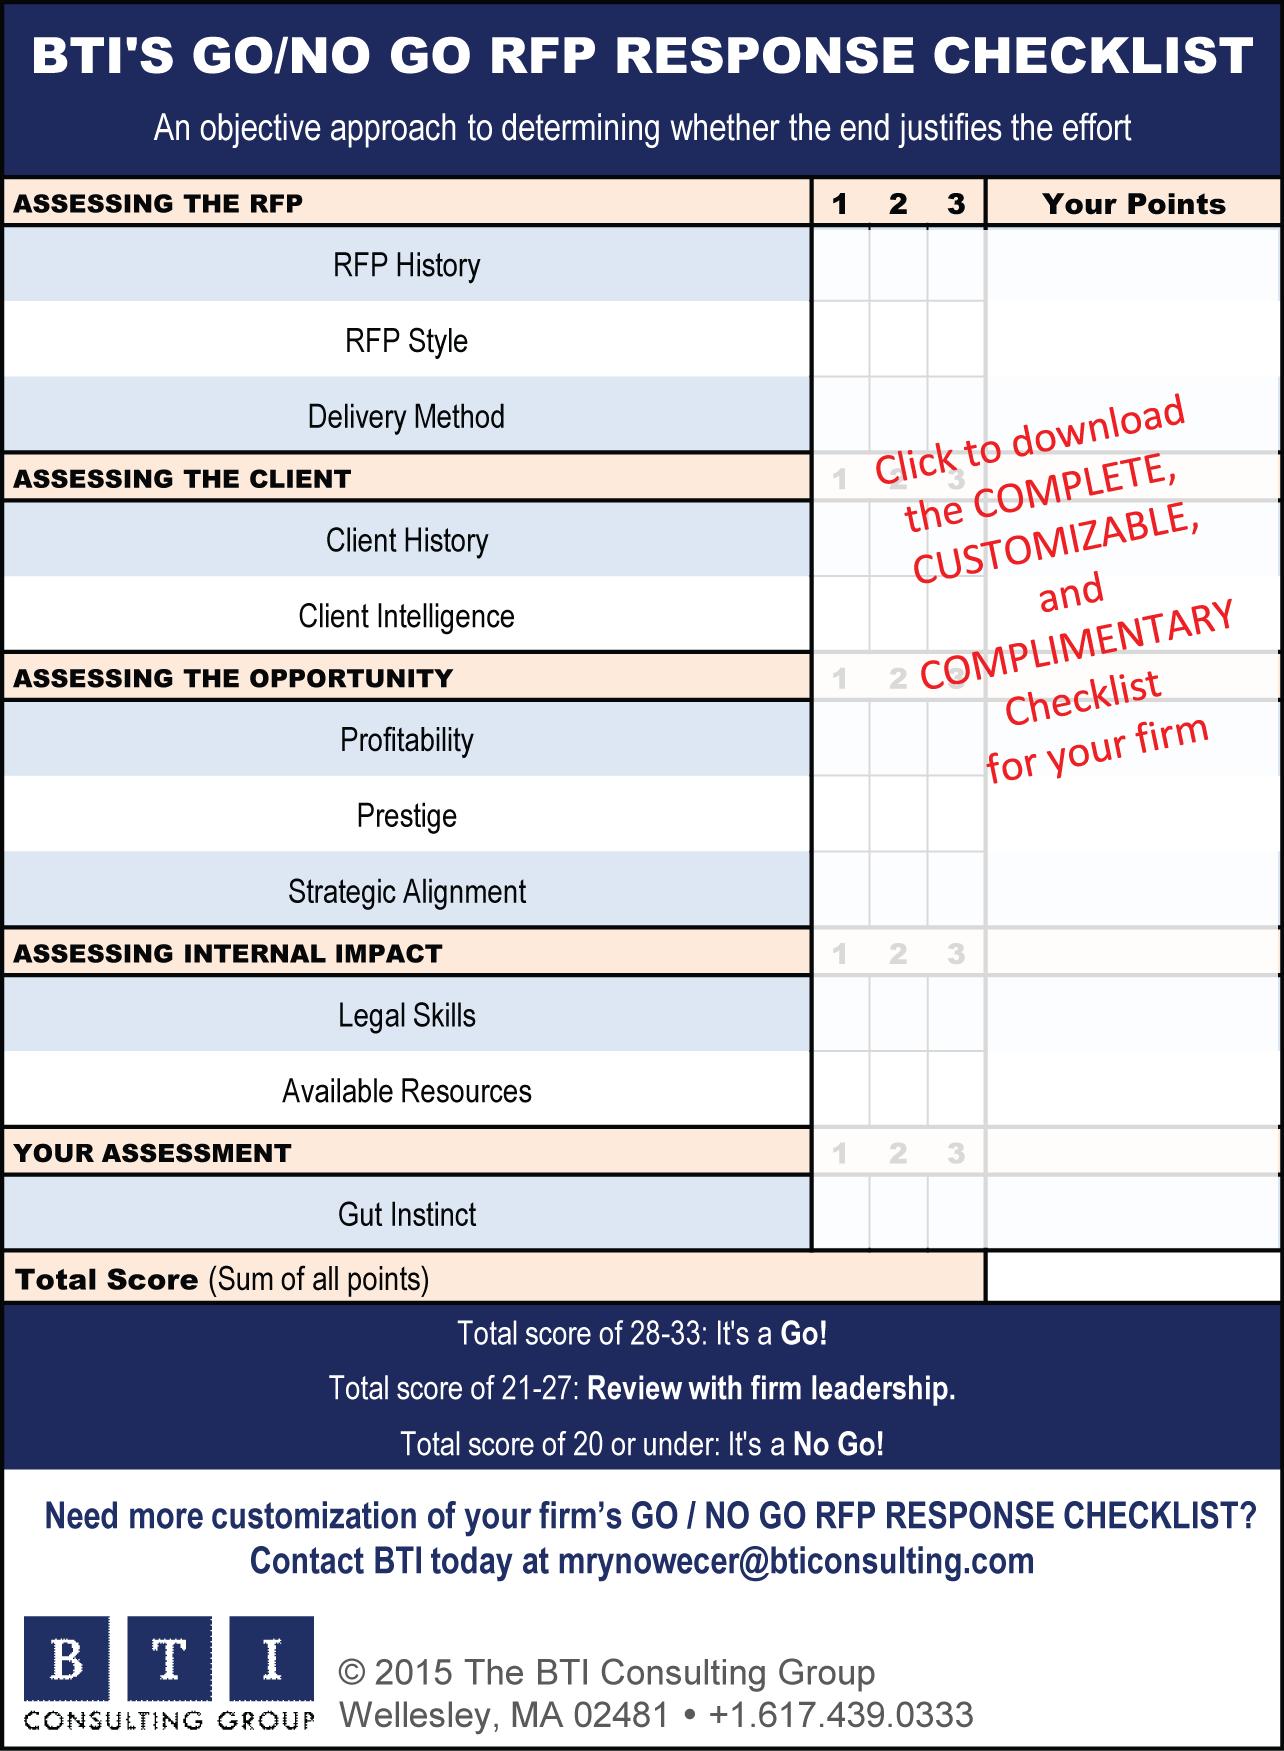 BTI_RFP_Go_No_Go_Checklist.png